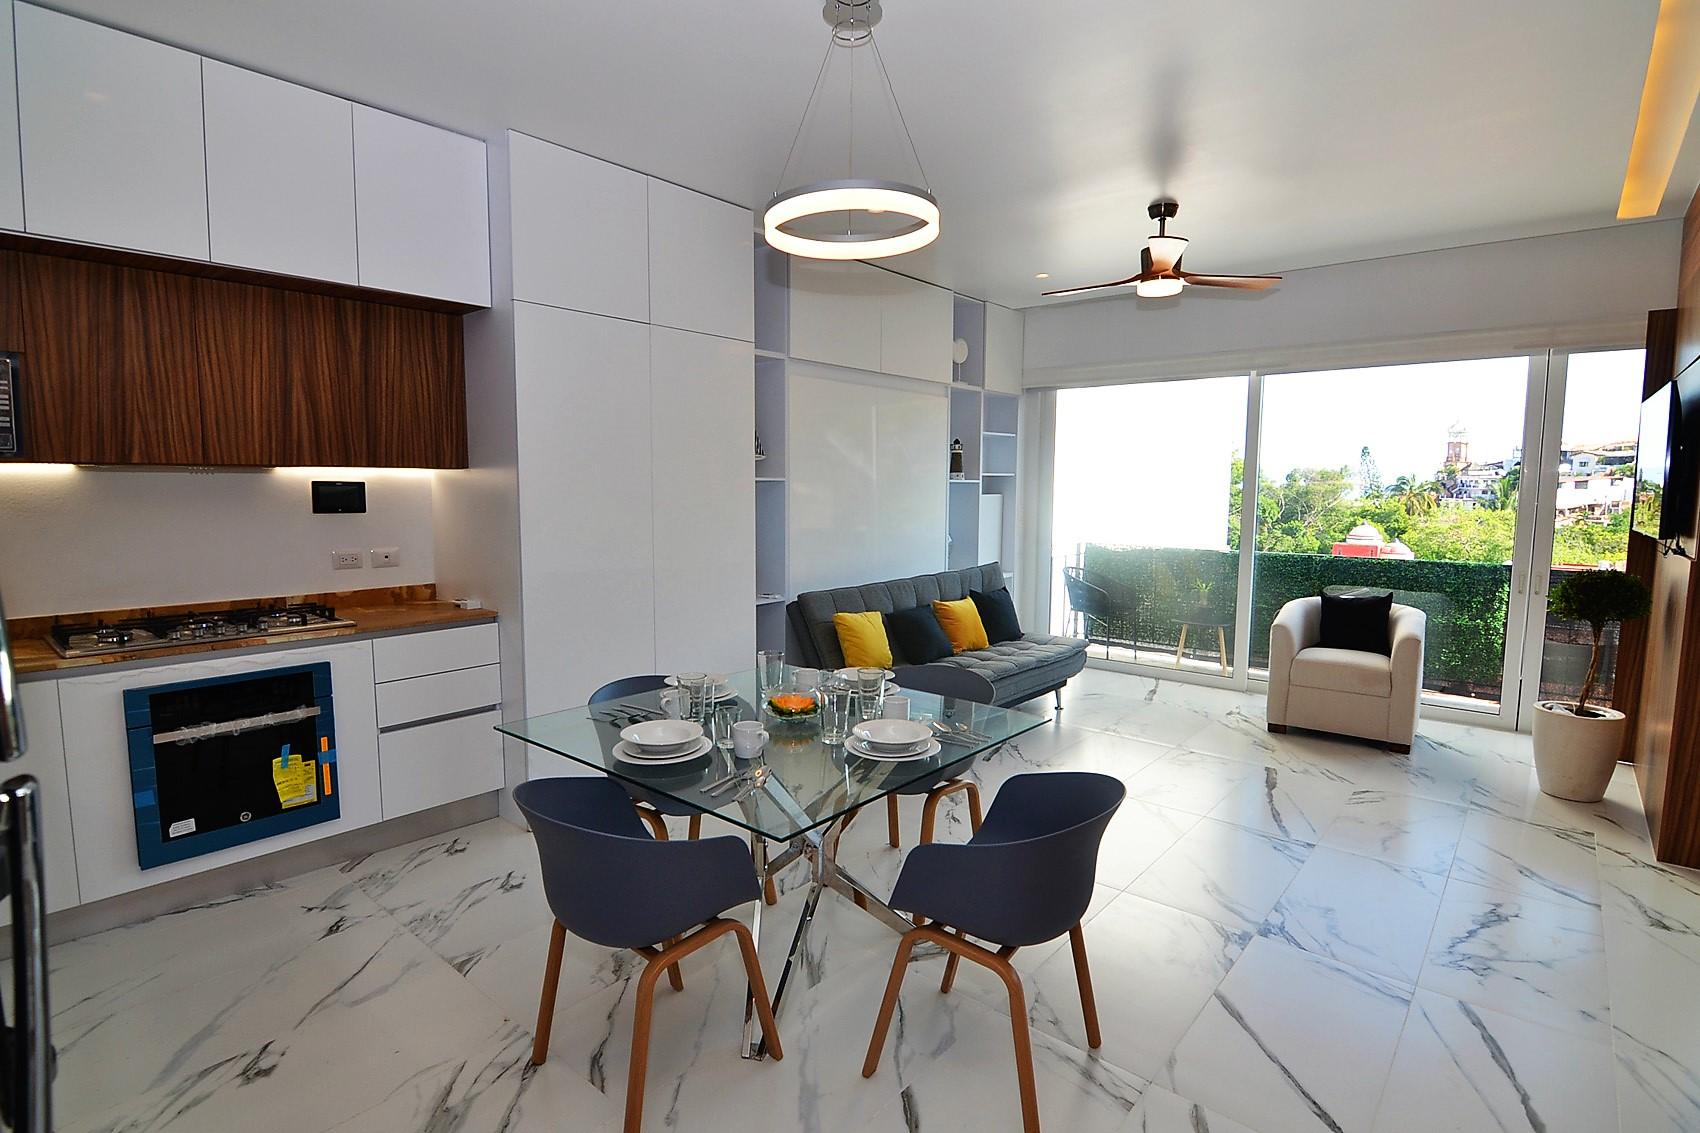 Condo Avida Super Studio 4 - Puerto Vallarta Furnished Condo Romantic Zone (3)